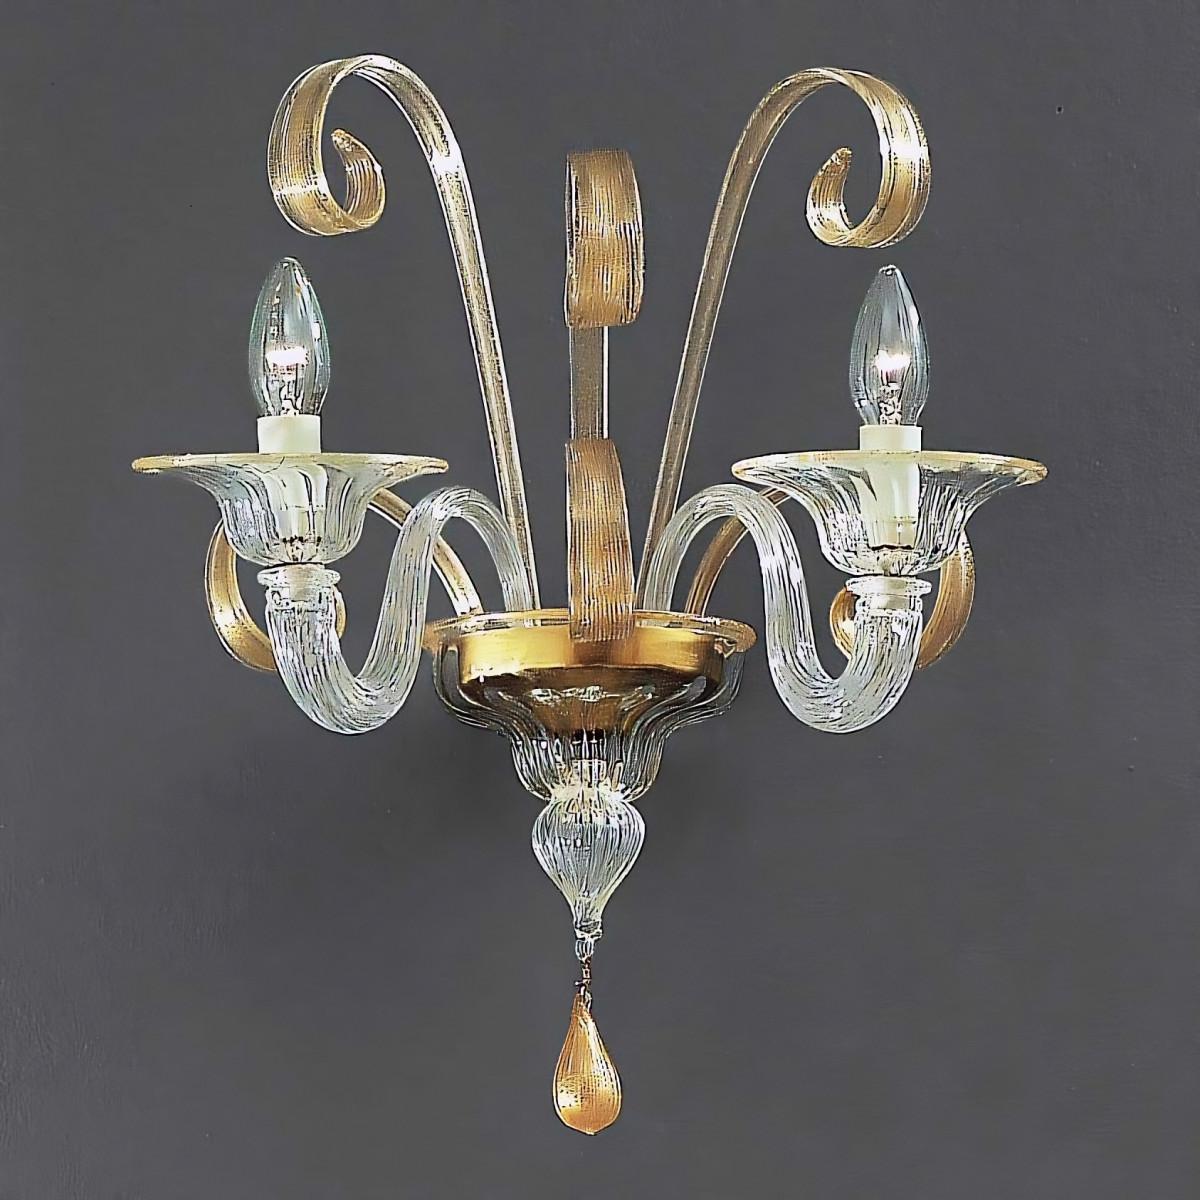 Goldoni 2 luces aplique de Murano - color transparente oro